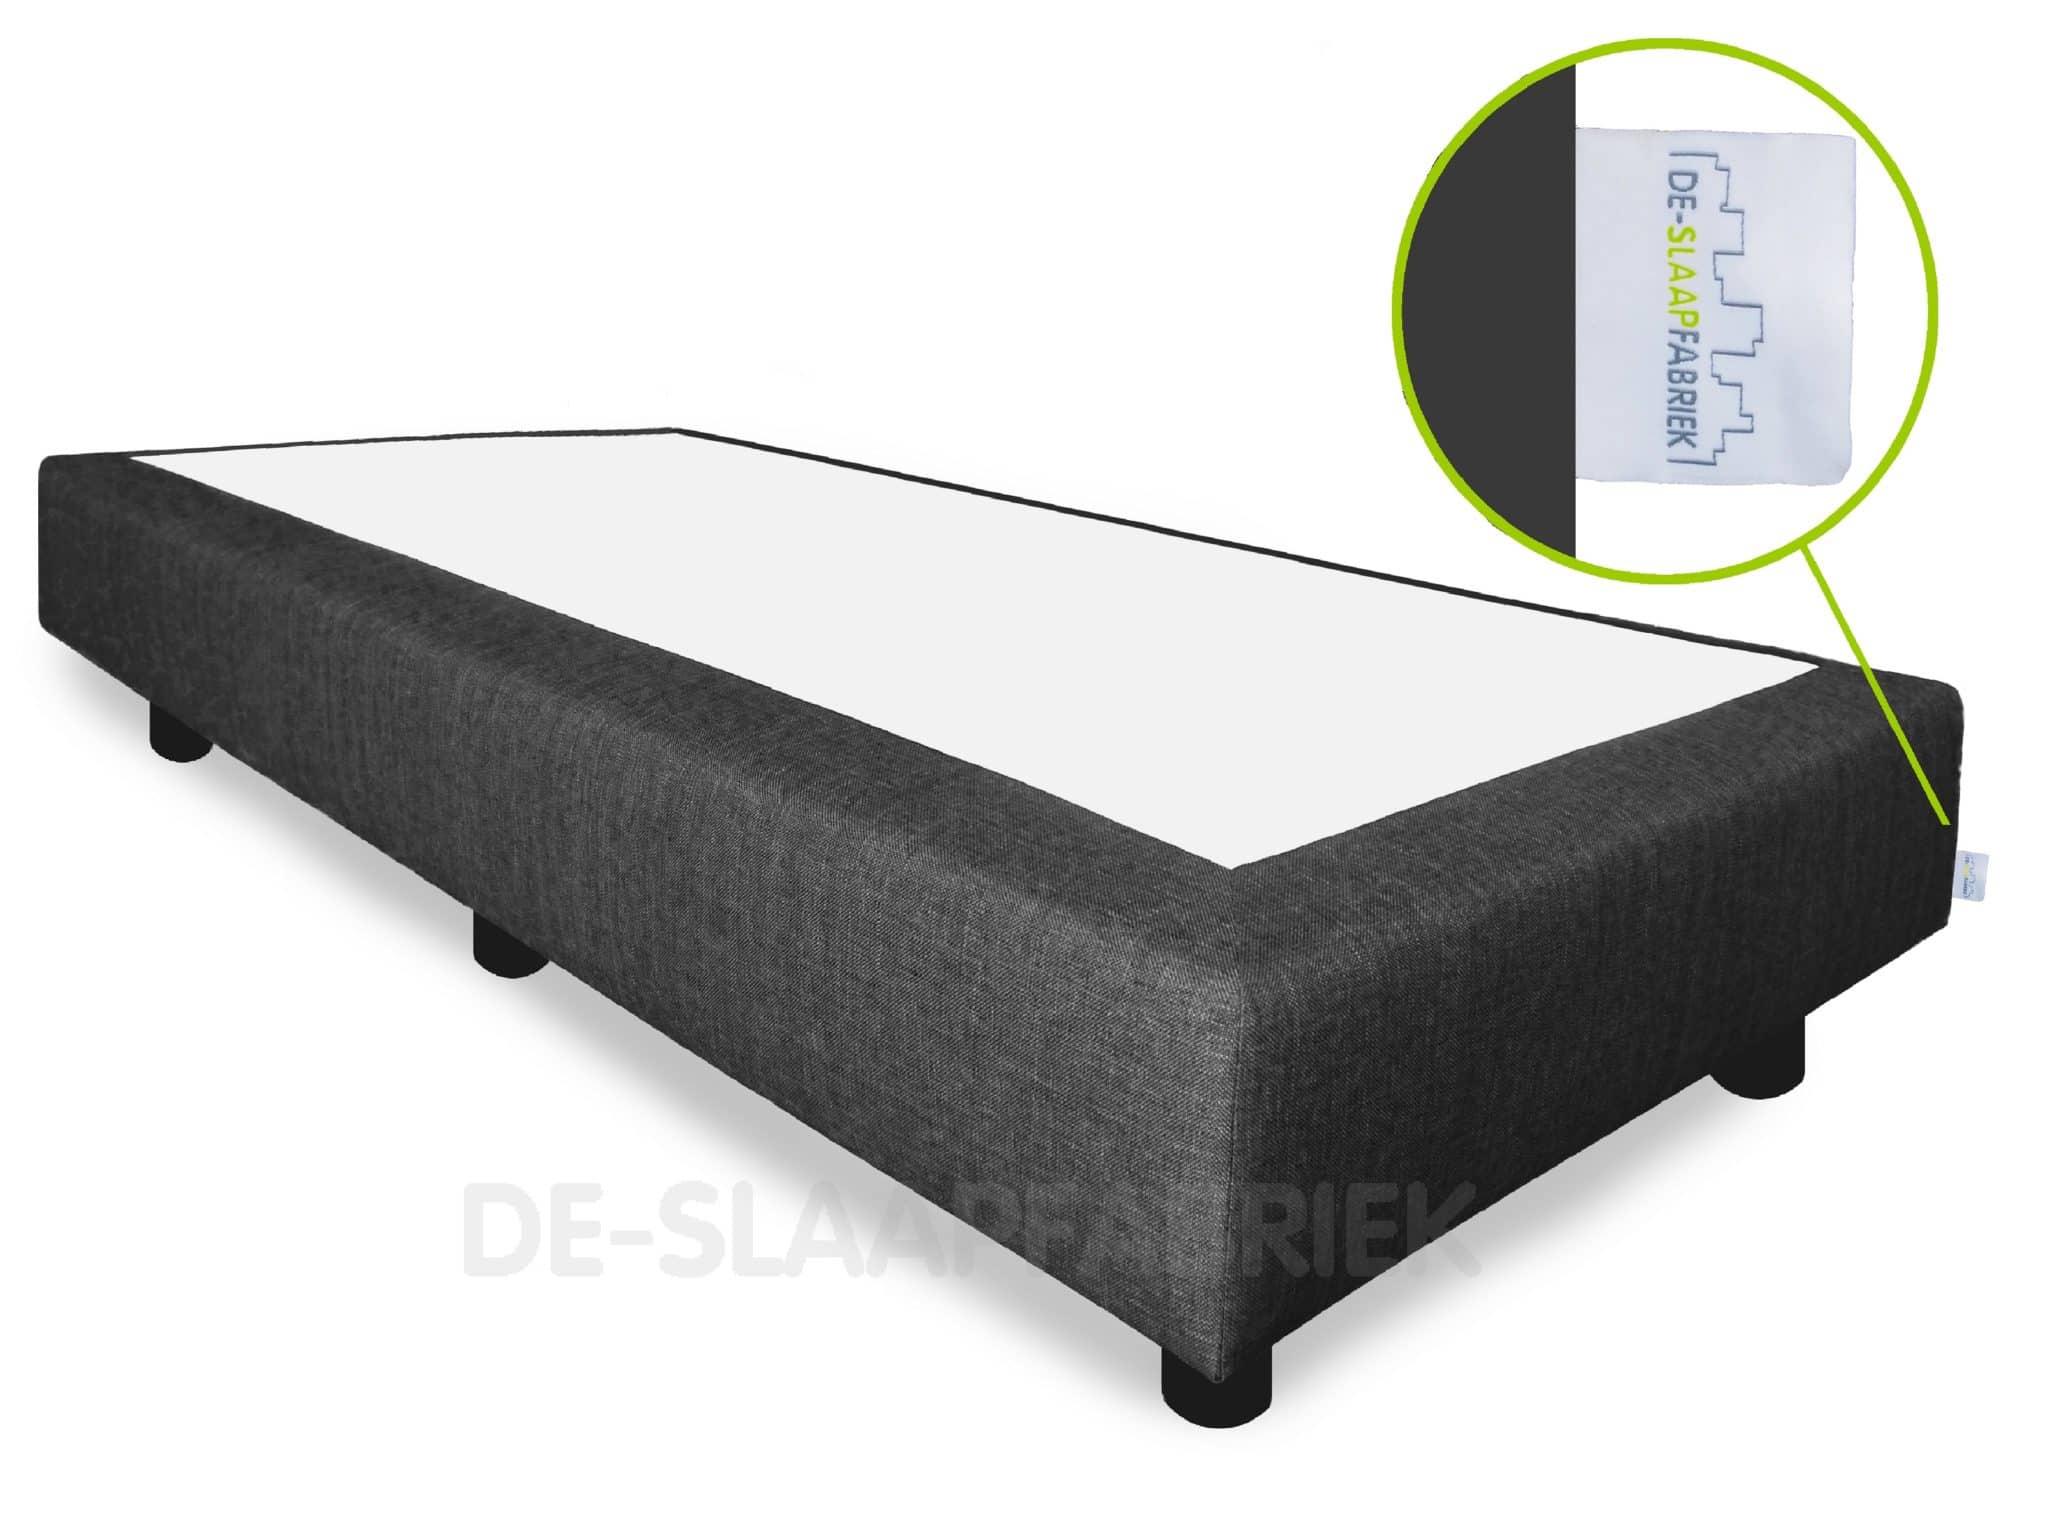 Boxspring Matras 90x210 : Boxspring zonder matras letto sani de slaapfabriek